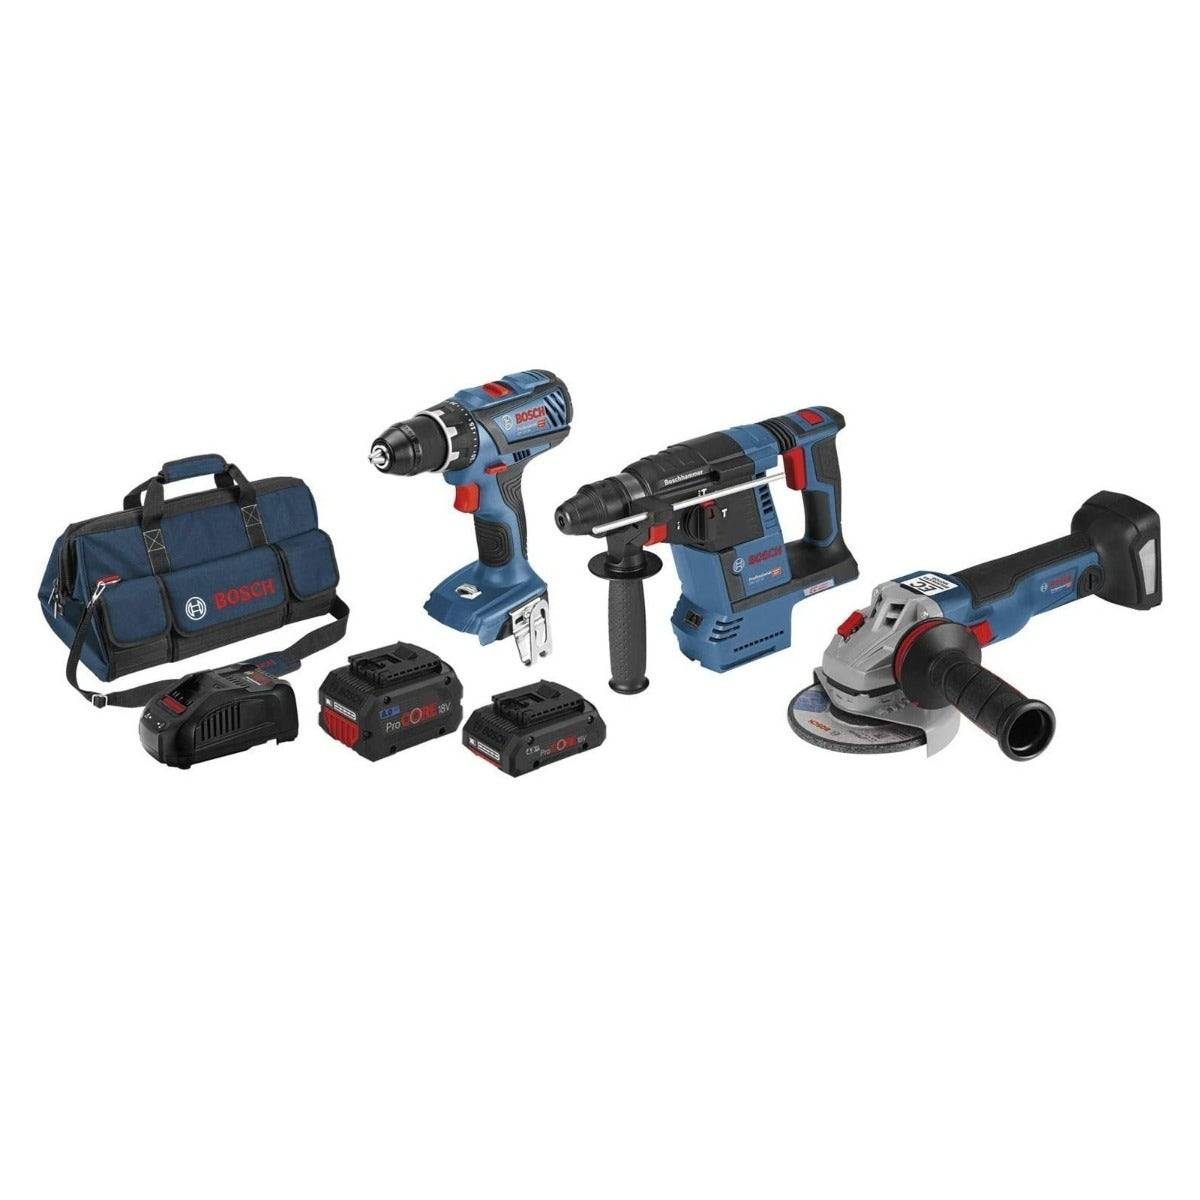 Bosch Kit 3 outils : Perceuse-visseuse GSR 18V-28 + Meuleuse angulaire GWS 18V-10 C + Perforateur GBH 18V-26 + chargeur rapide + 1 batterie 4Ah + 1 batterie 8Ah + sac à outils